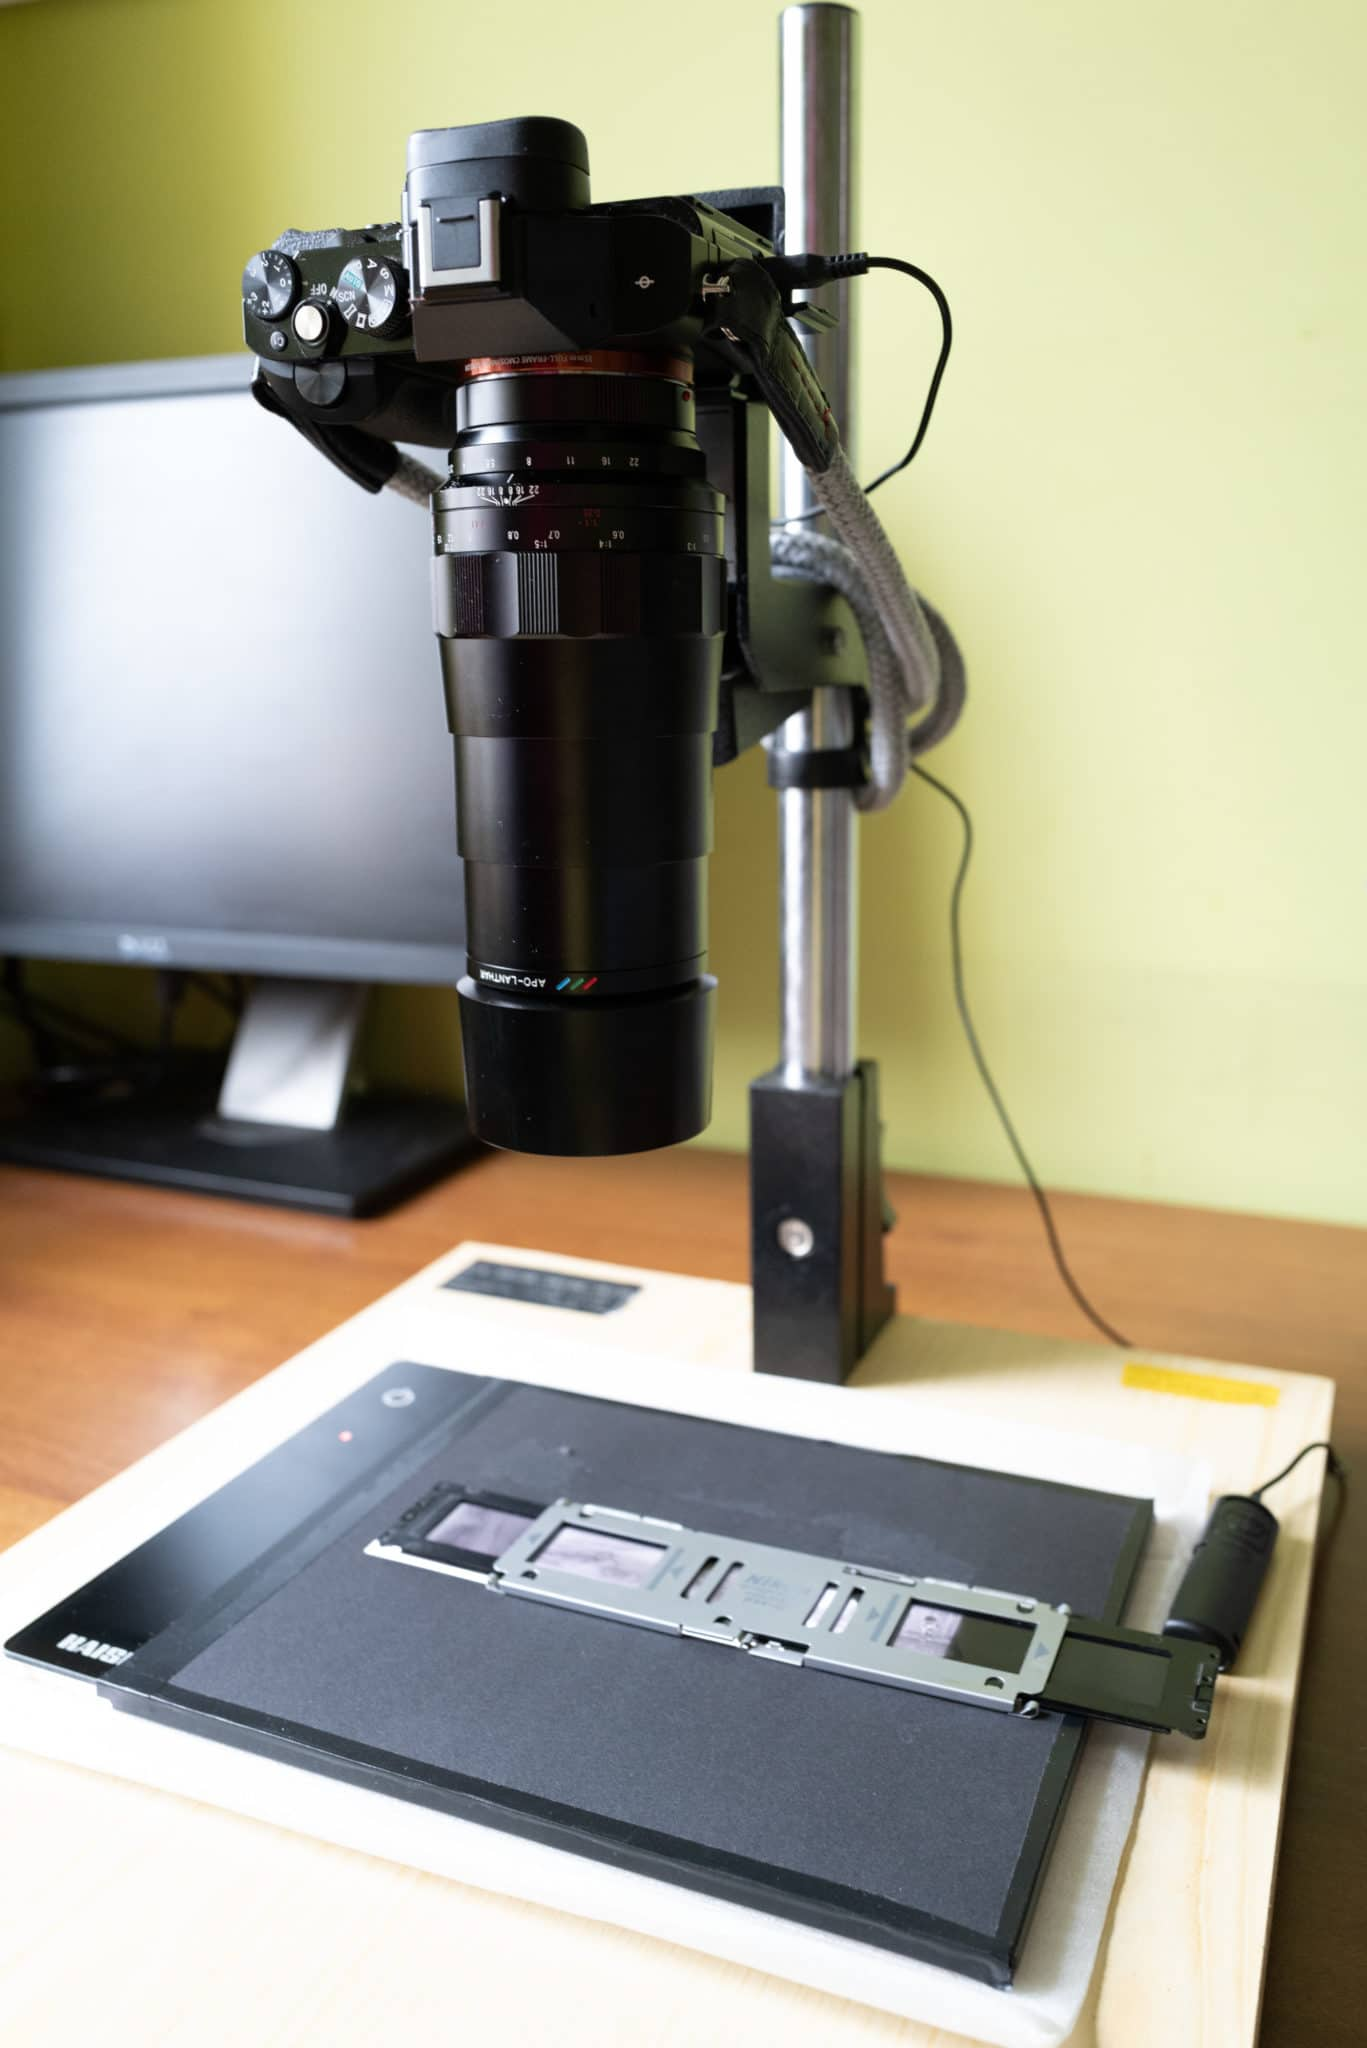 Voigtlander Macro Apo-Lanthar 110mm